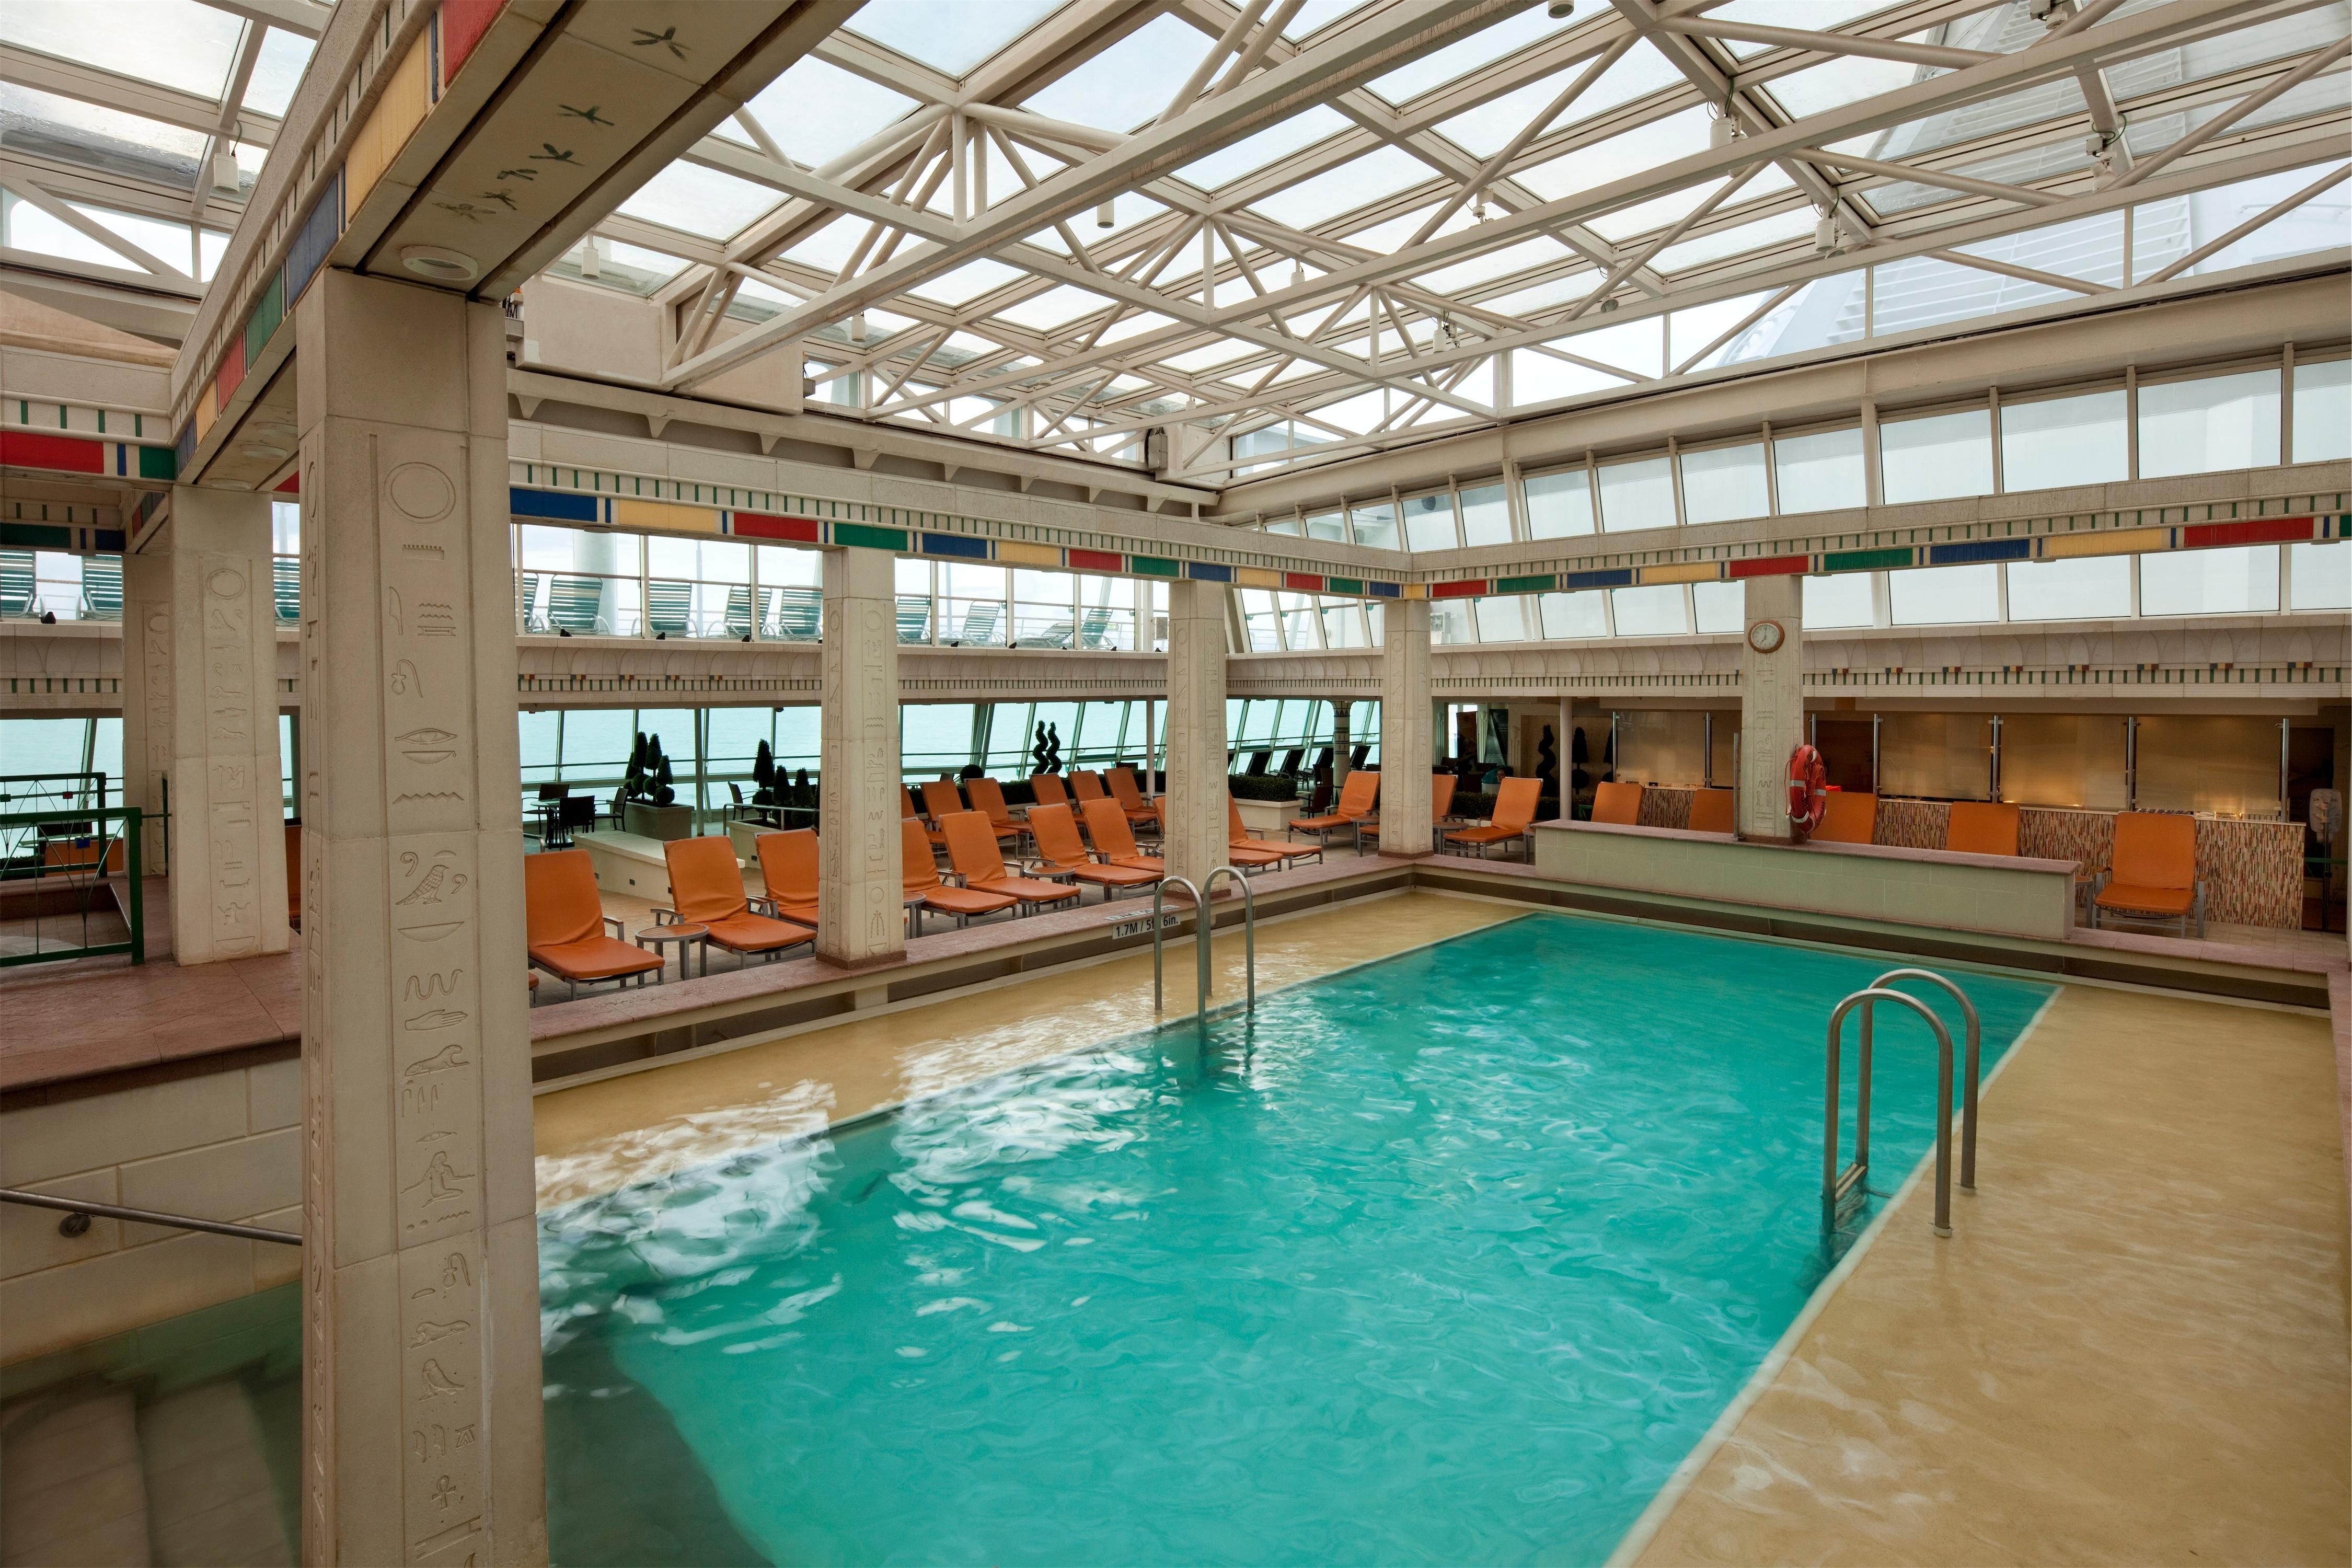 Royal Caribbean International Rhapsody of the Seas Interior Solarium 2.jpg